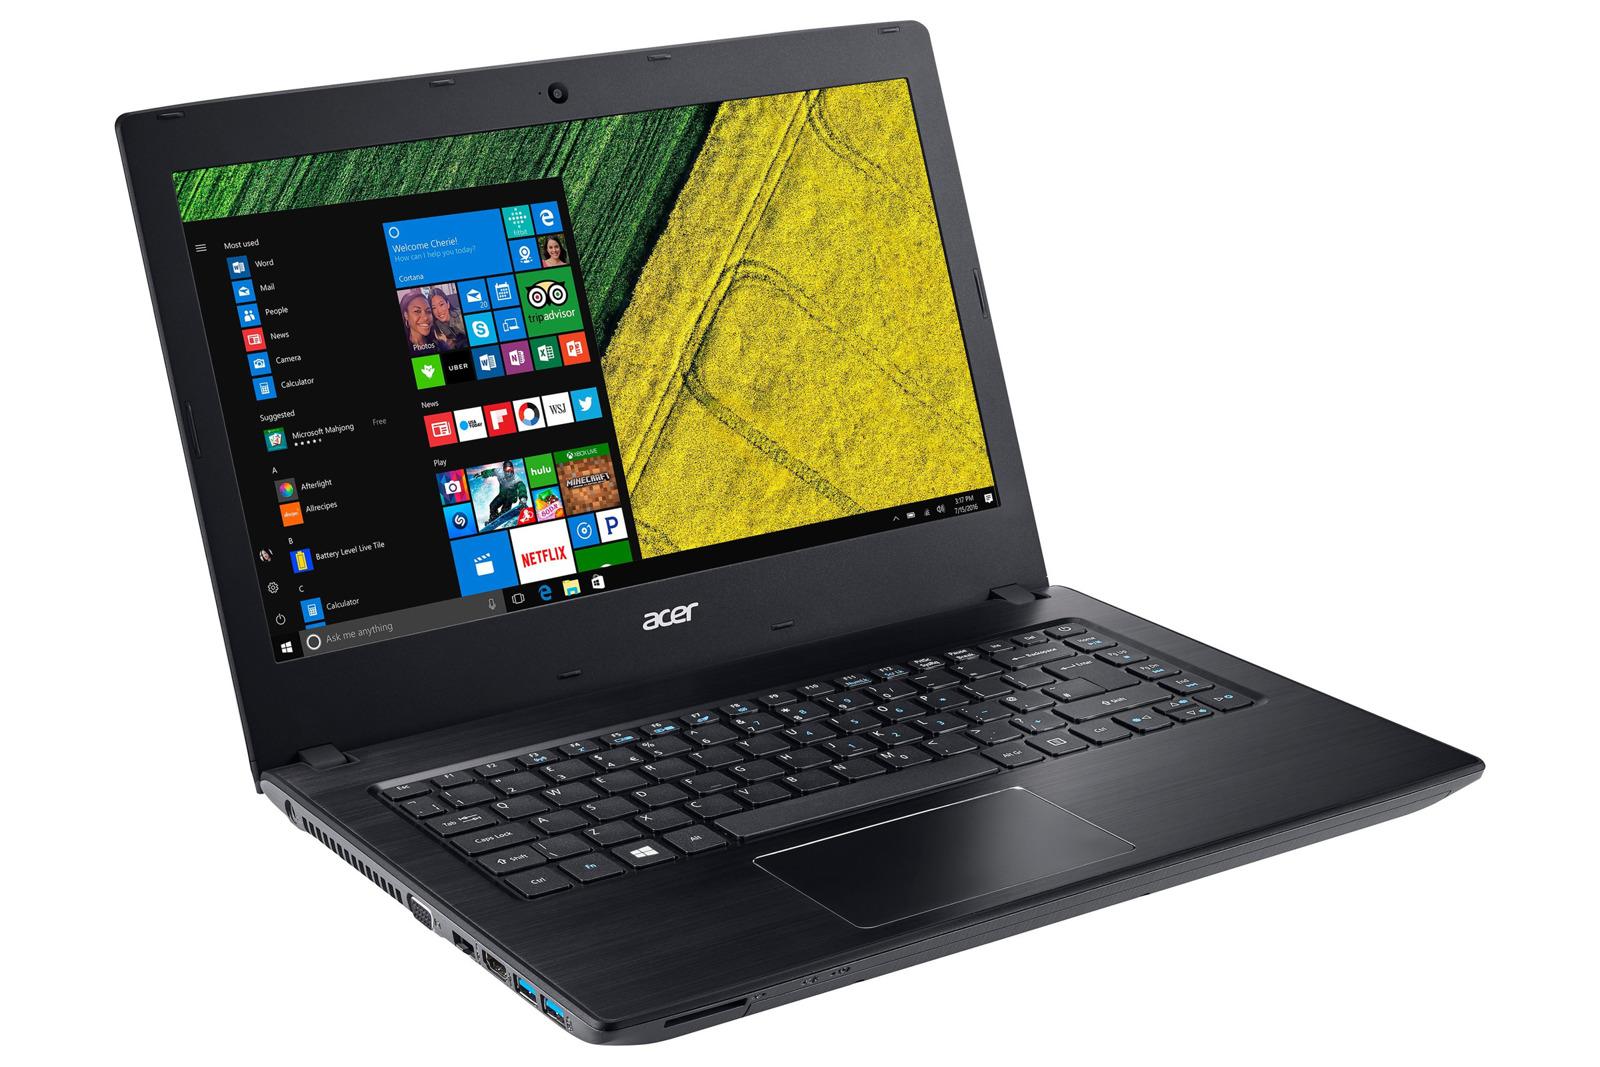 Laptop Acer Aspire E5 14 FHD i3 4GB 256GB SSD